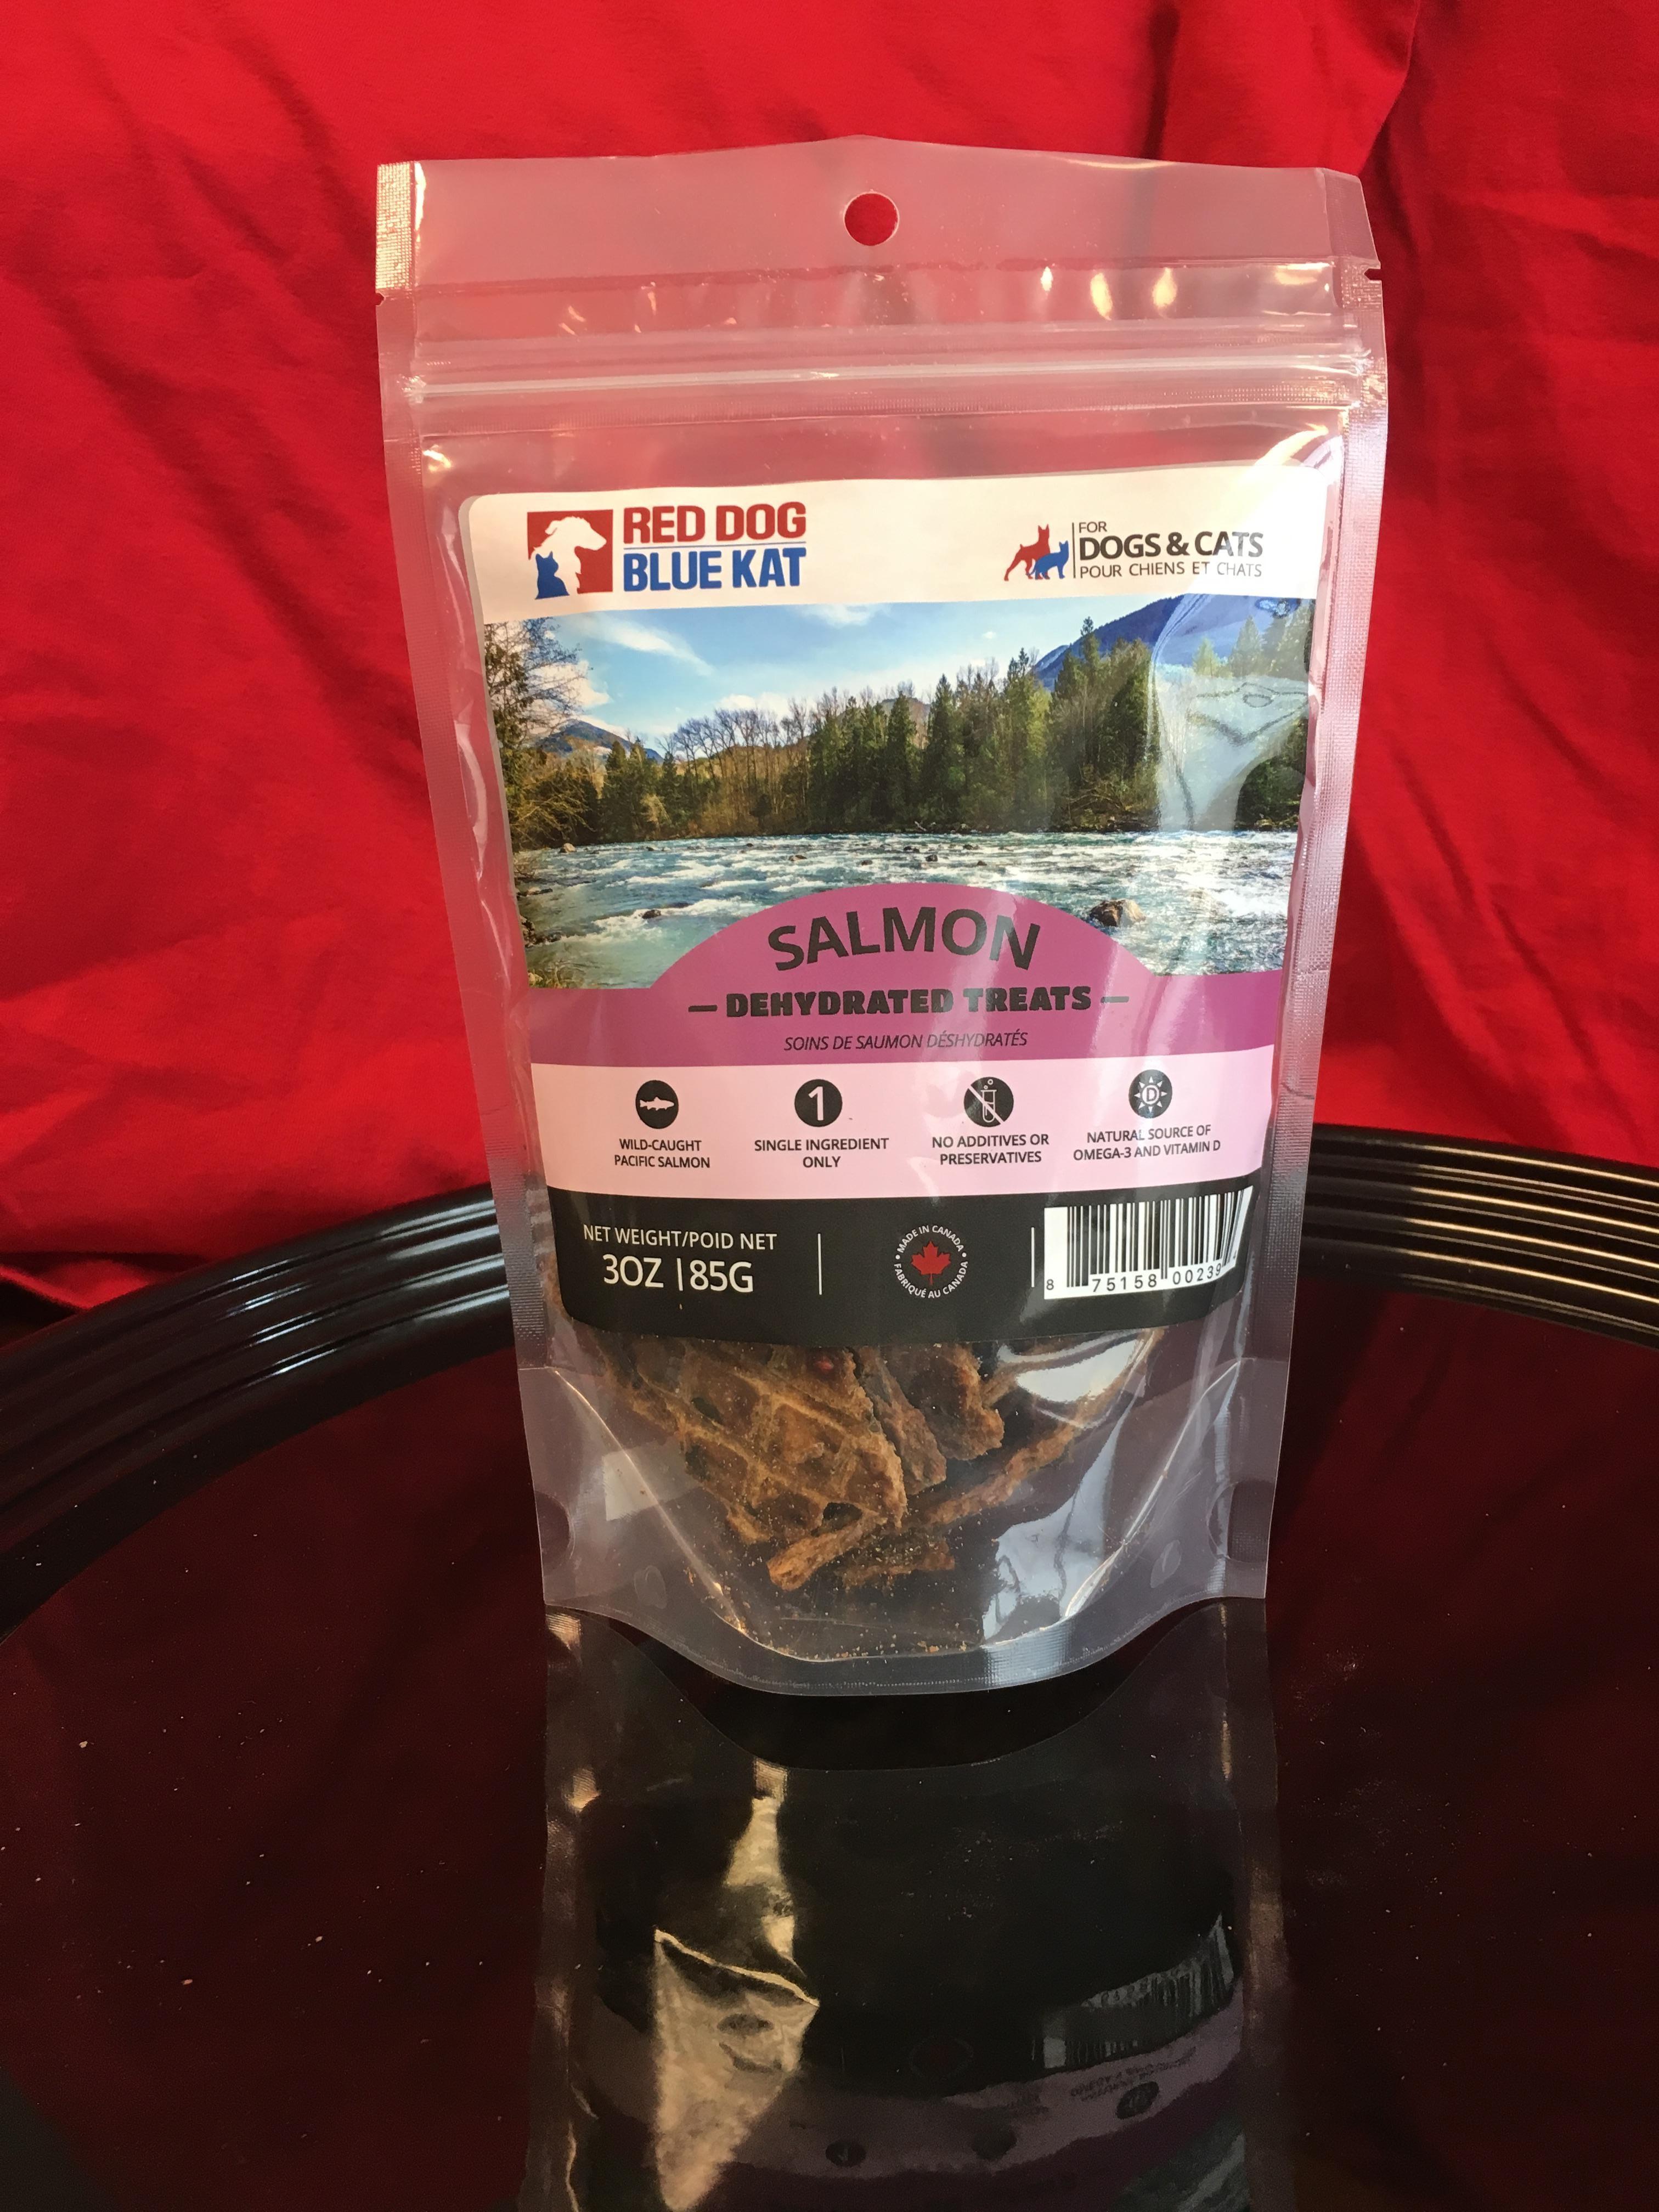 Red Dog Blue Kat Salmon Dehydrated Dog Treats, 85-gram